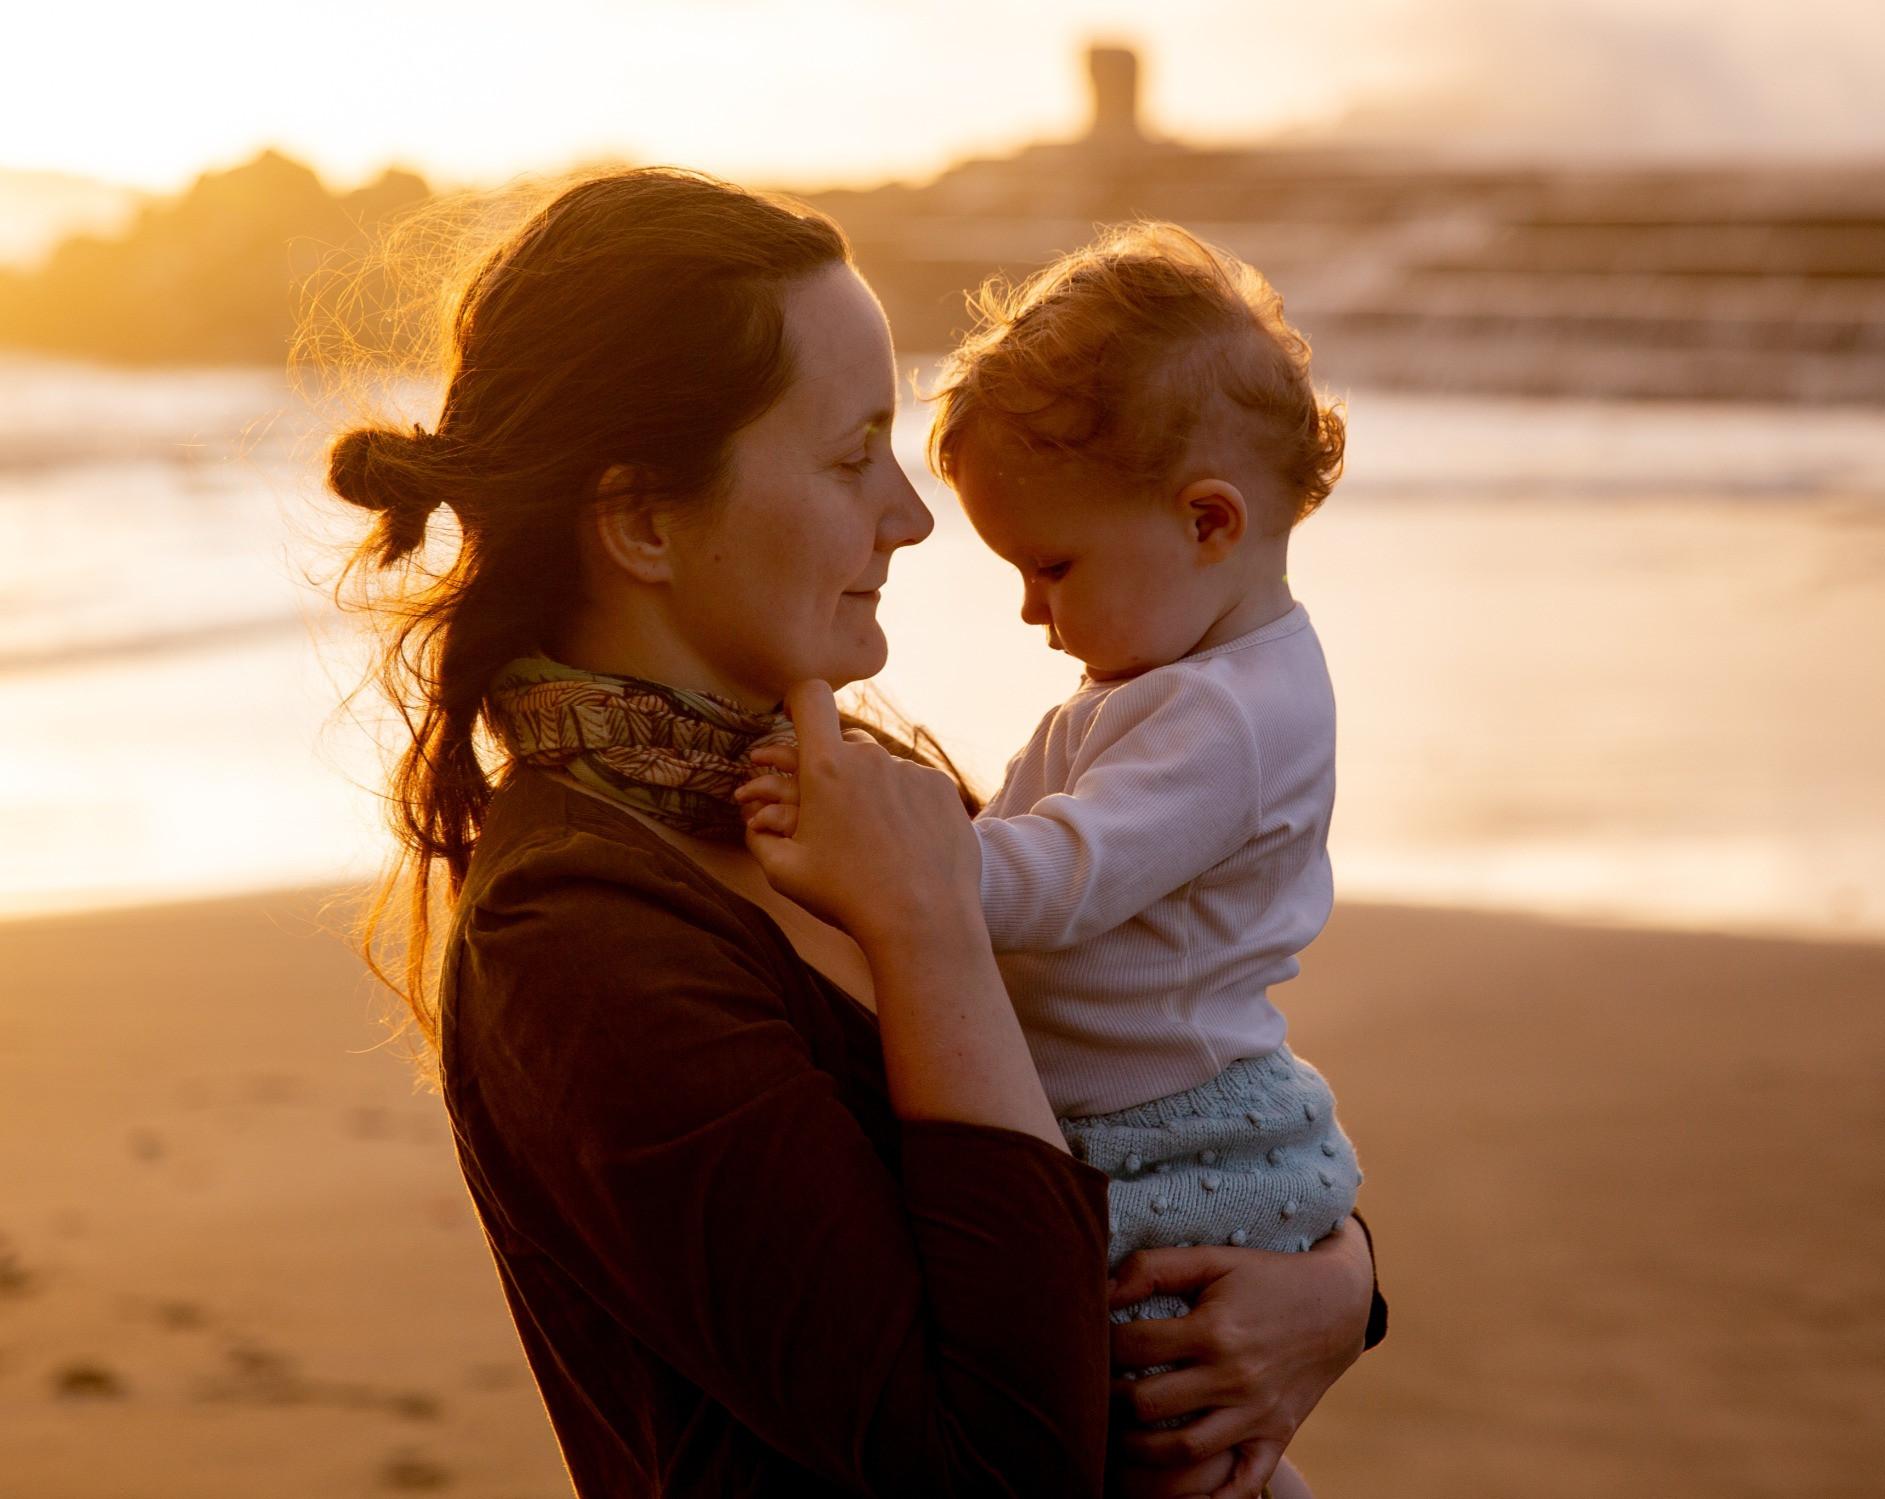 Birth Story Integration